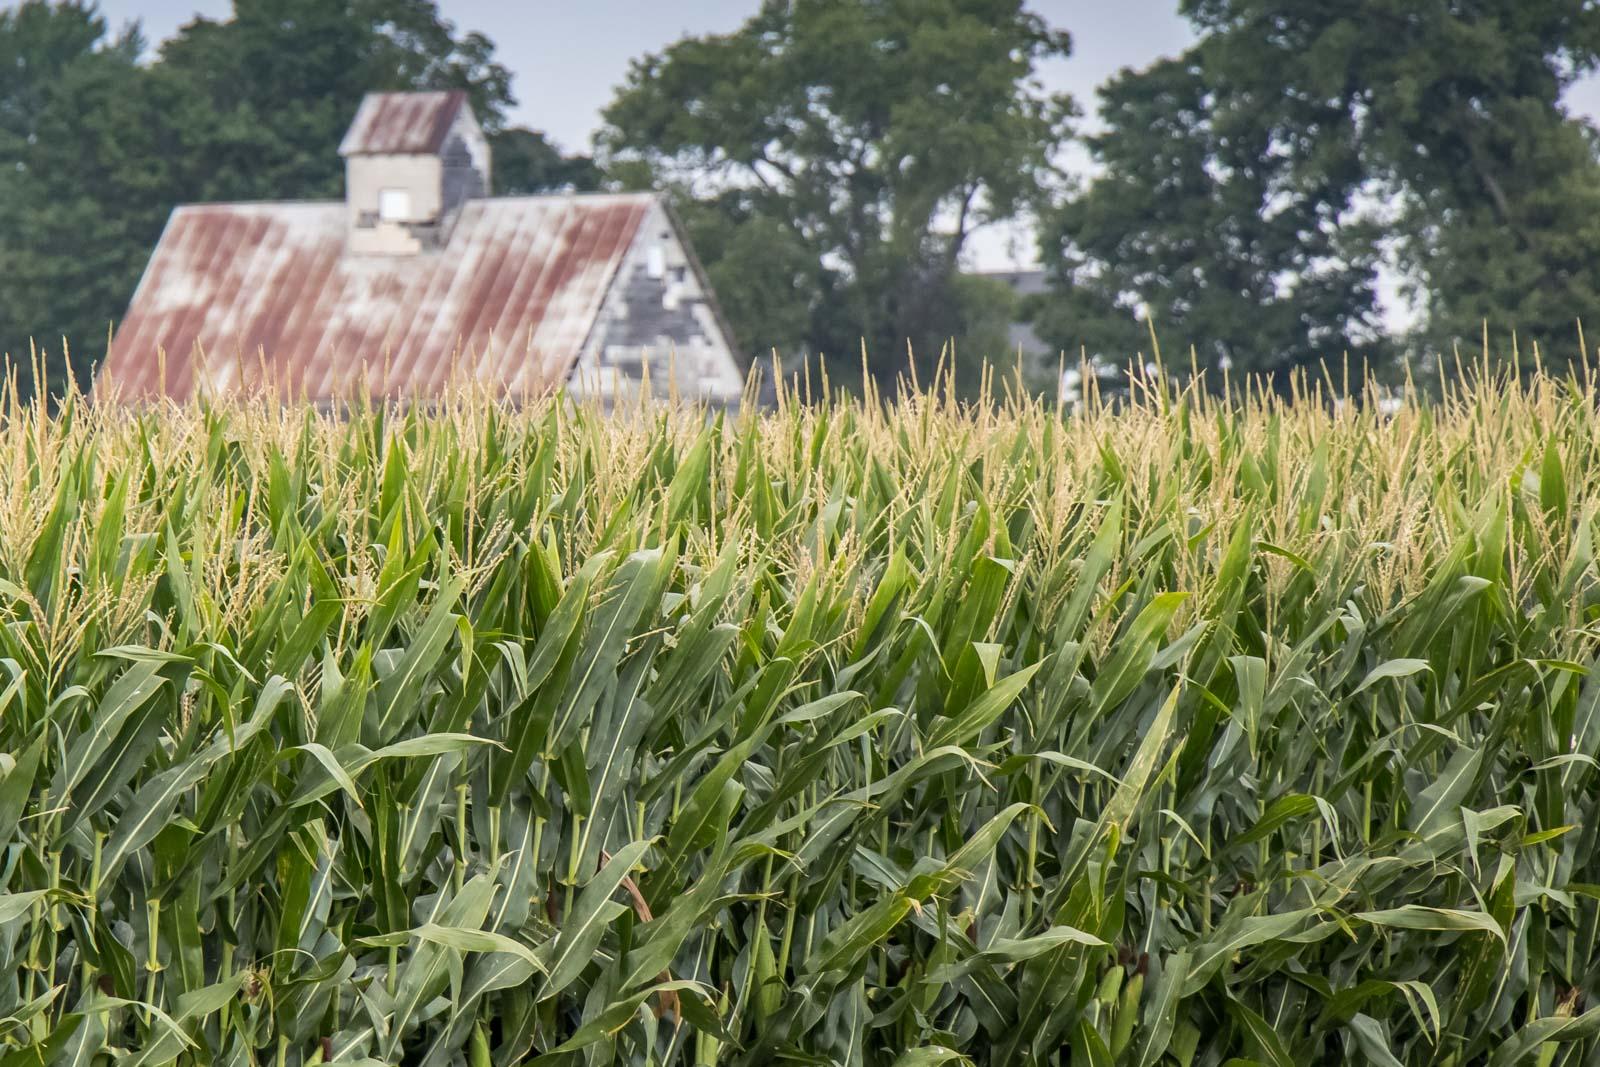 corn stalks and barn